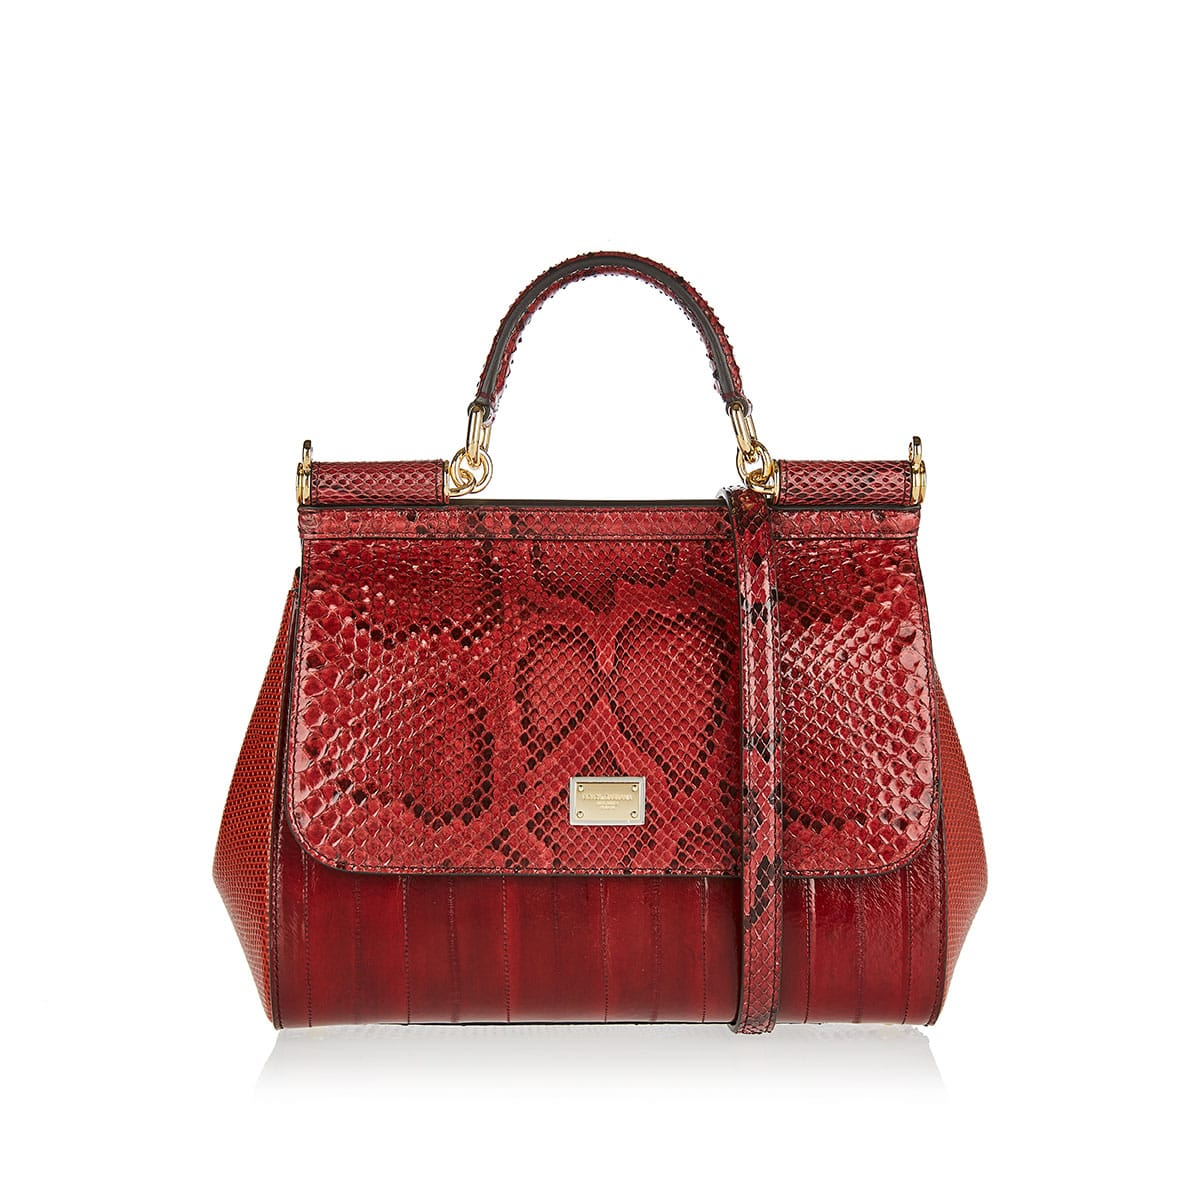 Sicily Medium python and leather bag